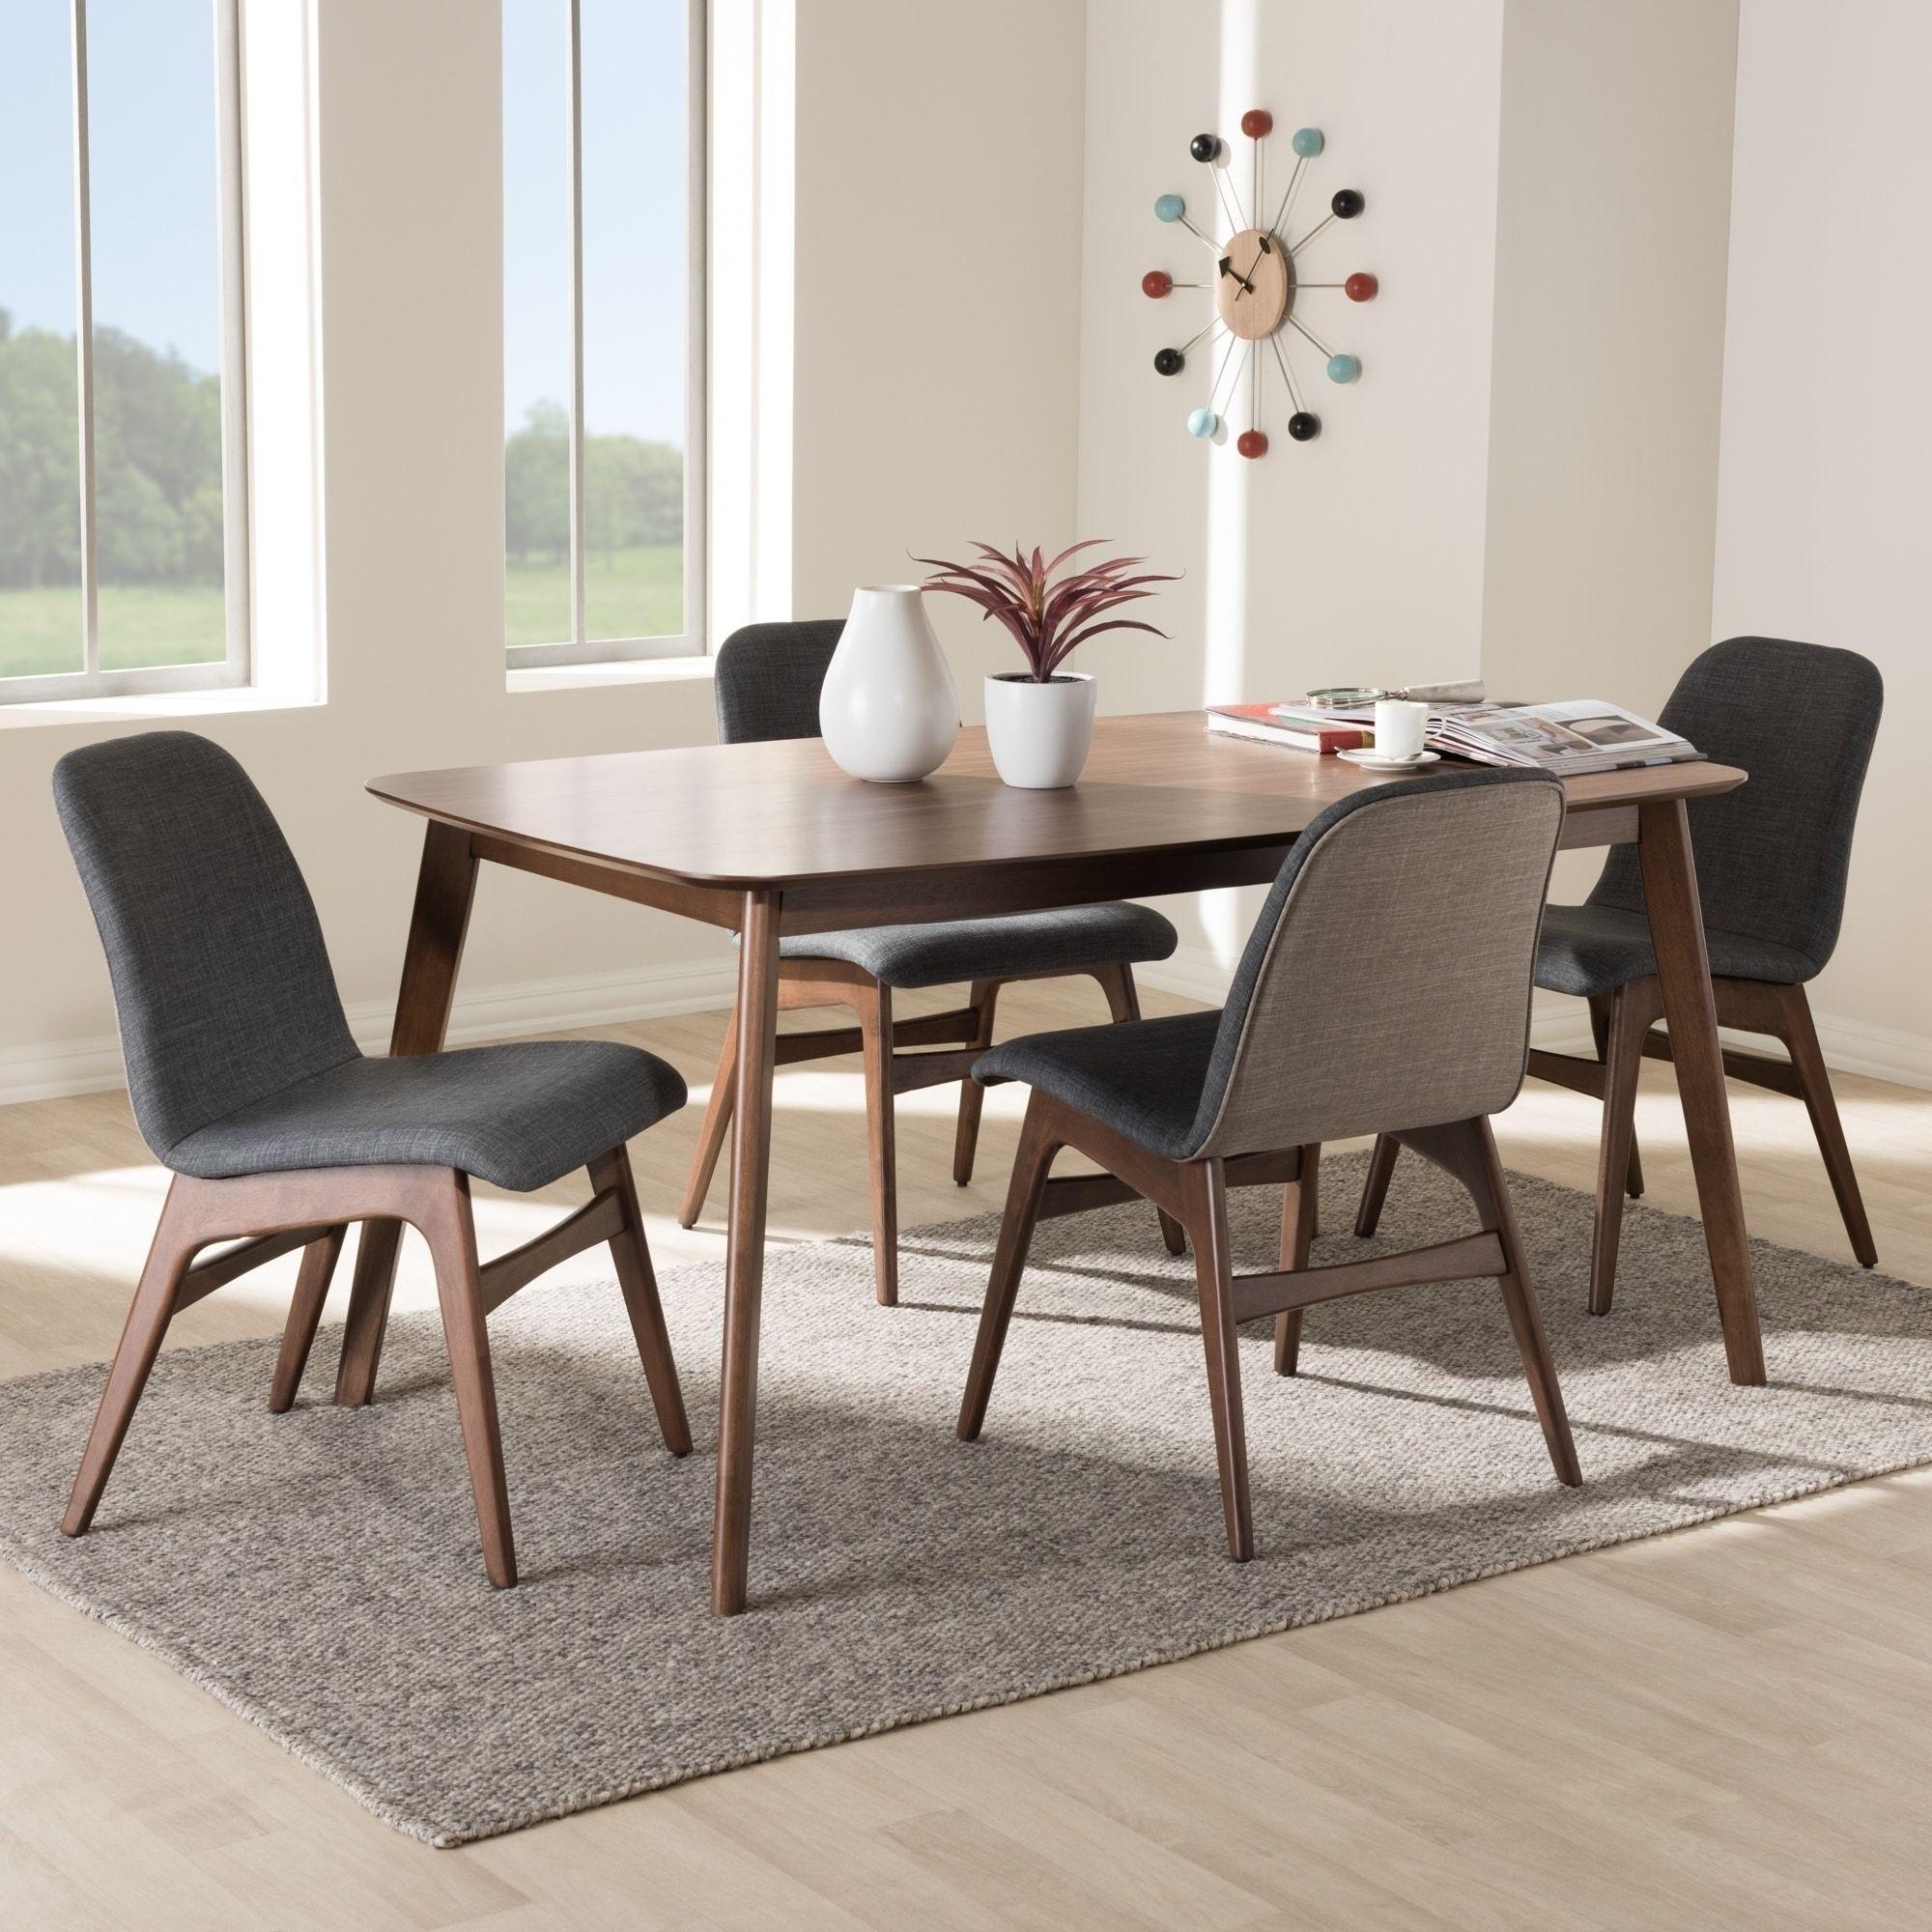 e2baab5851b06 Our Best Dining Room   Bar Furniture Deals. Carson Carrington Solna Mid- century Dark Grey Fabric 5-Piece Dining Set (Charcoal)